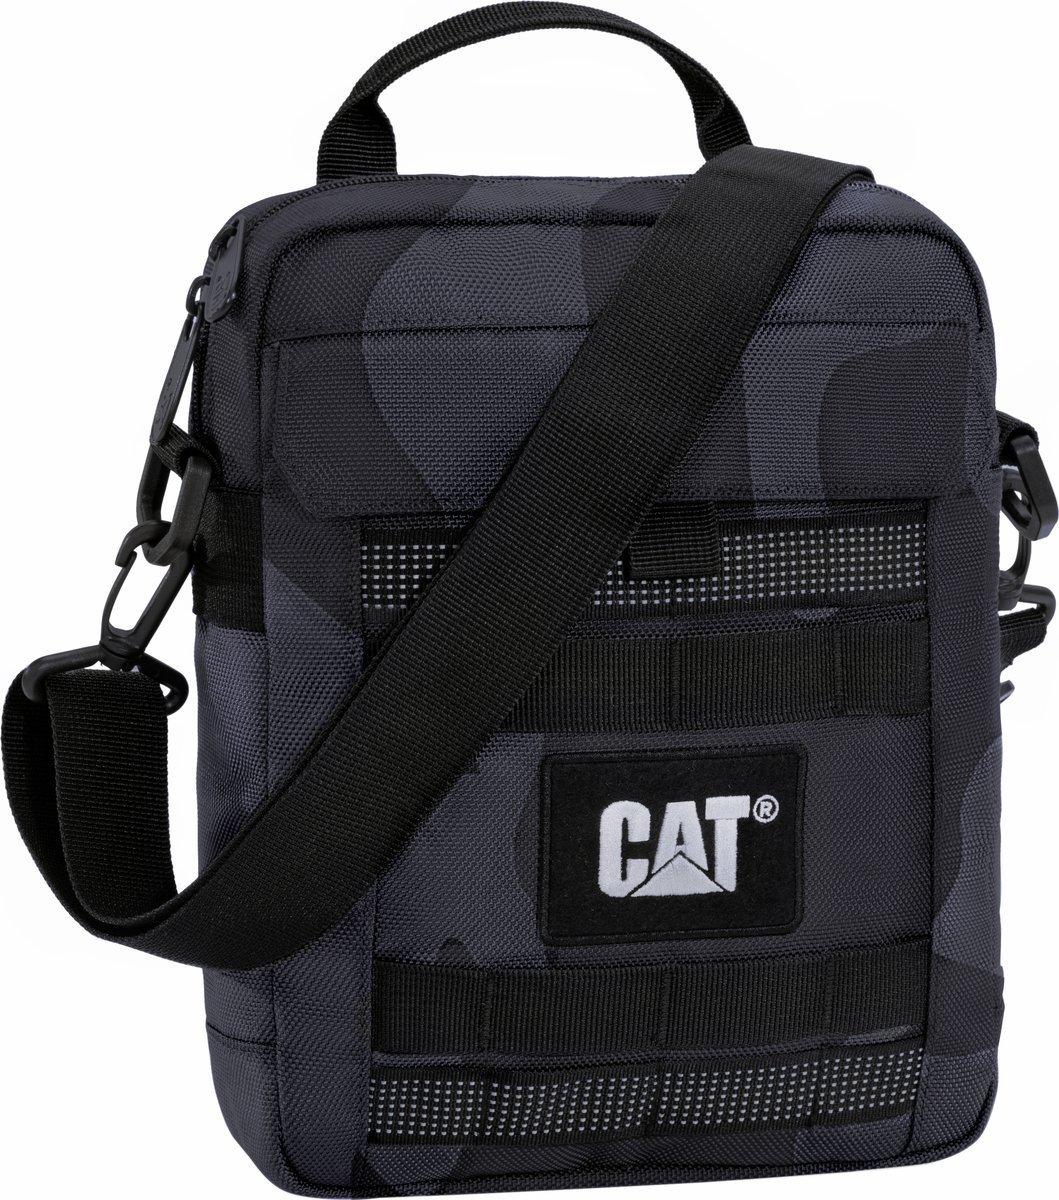 "Torba Namib na tablet do 10"" CAT Caterpillar szara"